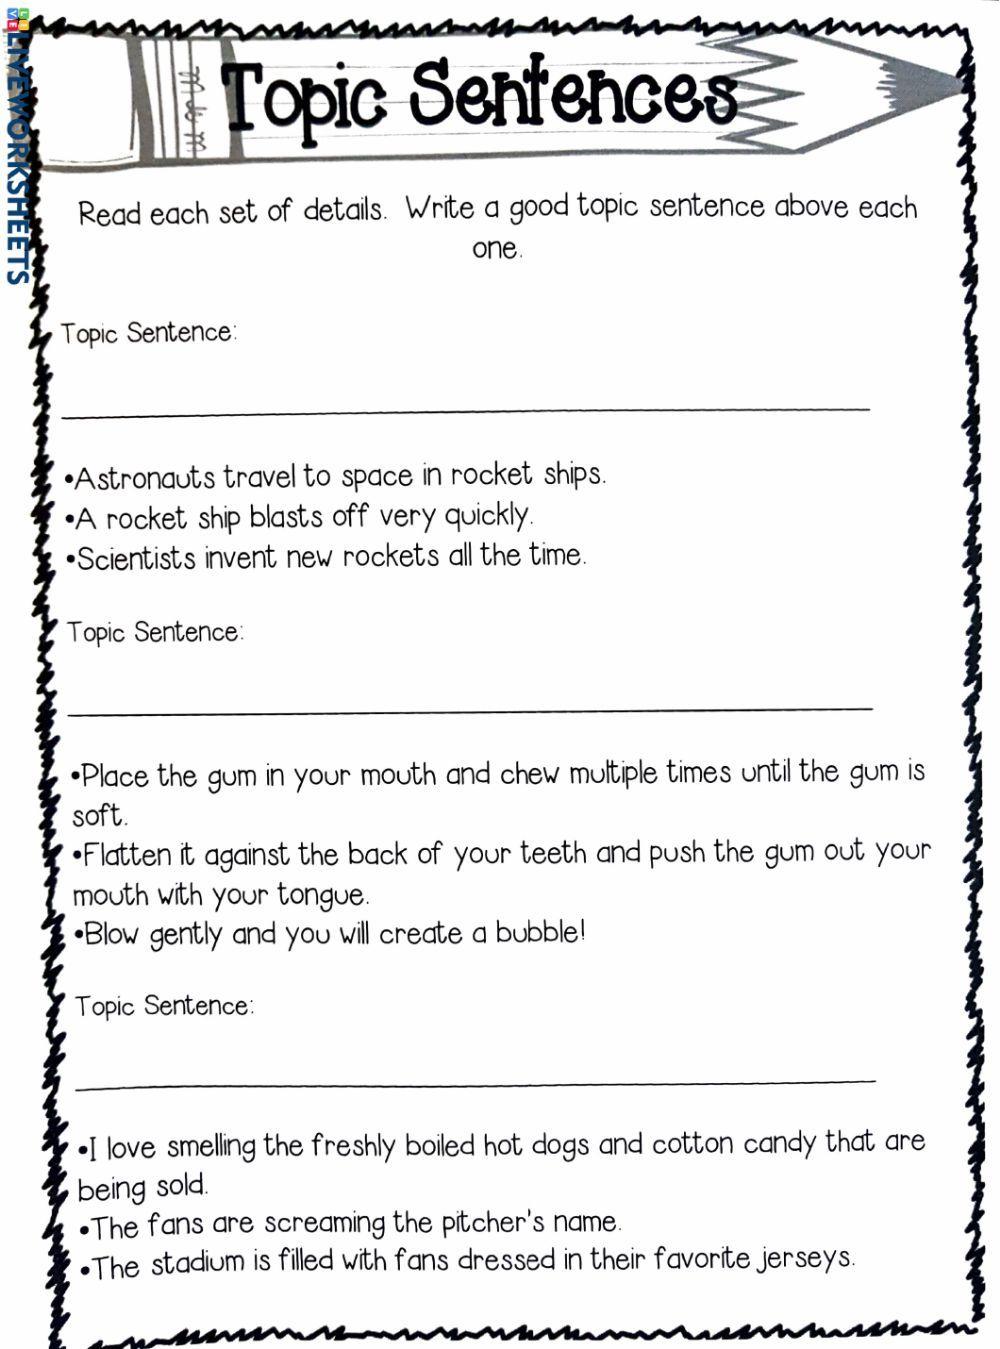 Topic Sentences Activity In 2020 Topic Sentences Activities Sentence Activities Topic Sentences